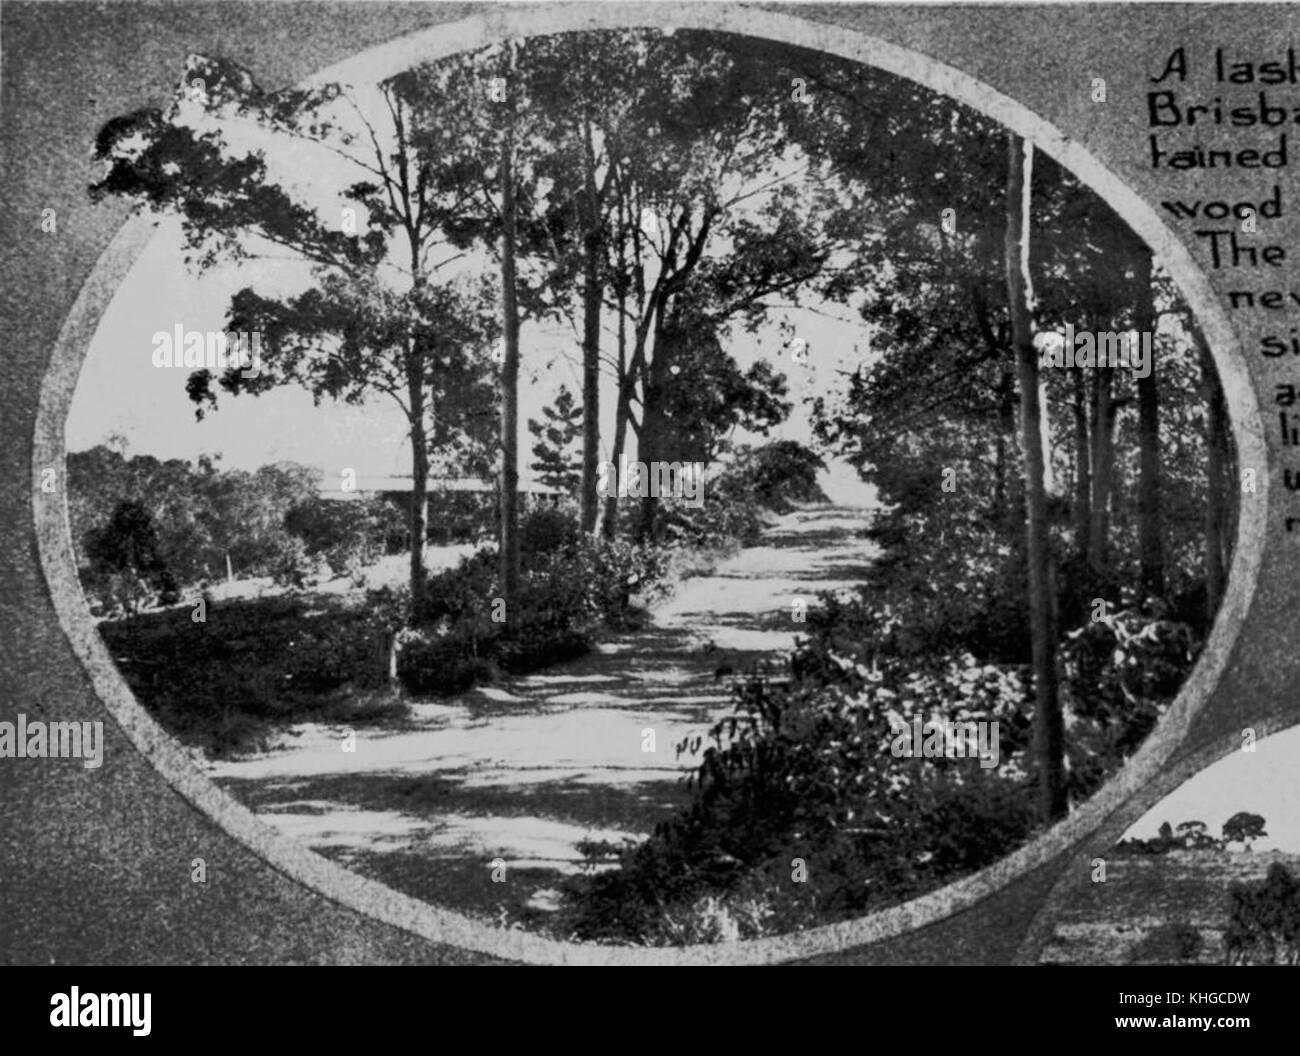 1 68671 Along the road in Moggill in 1928 Stock Photo